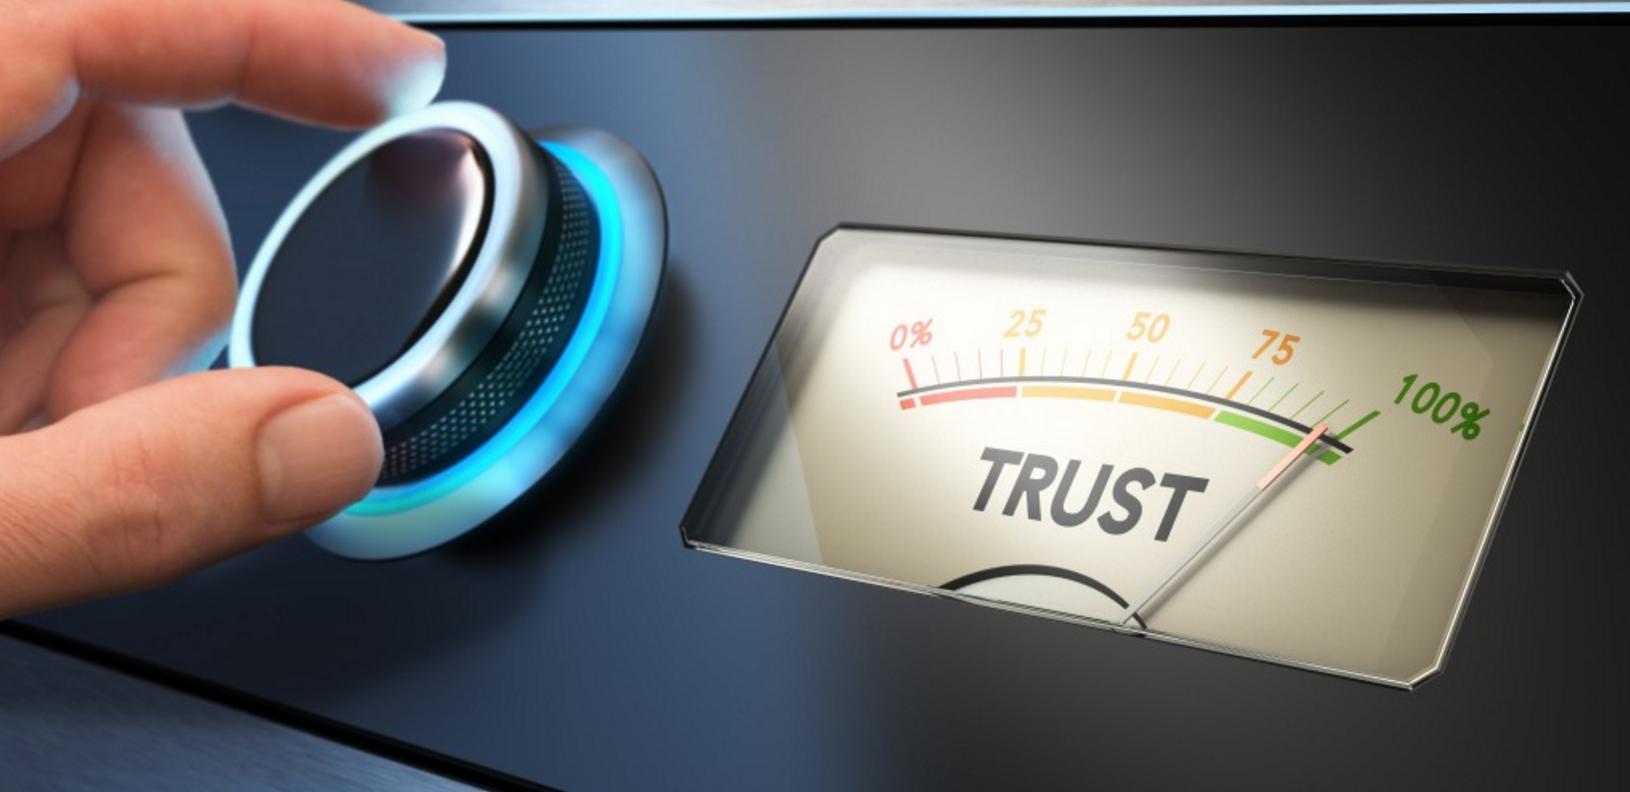 Video Trust